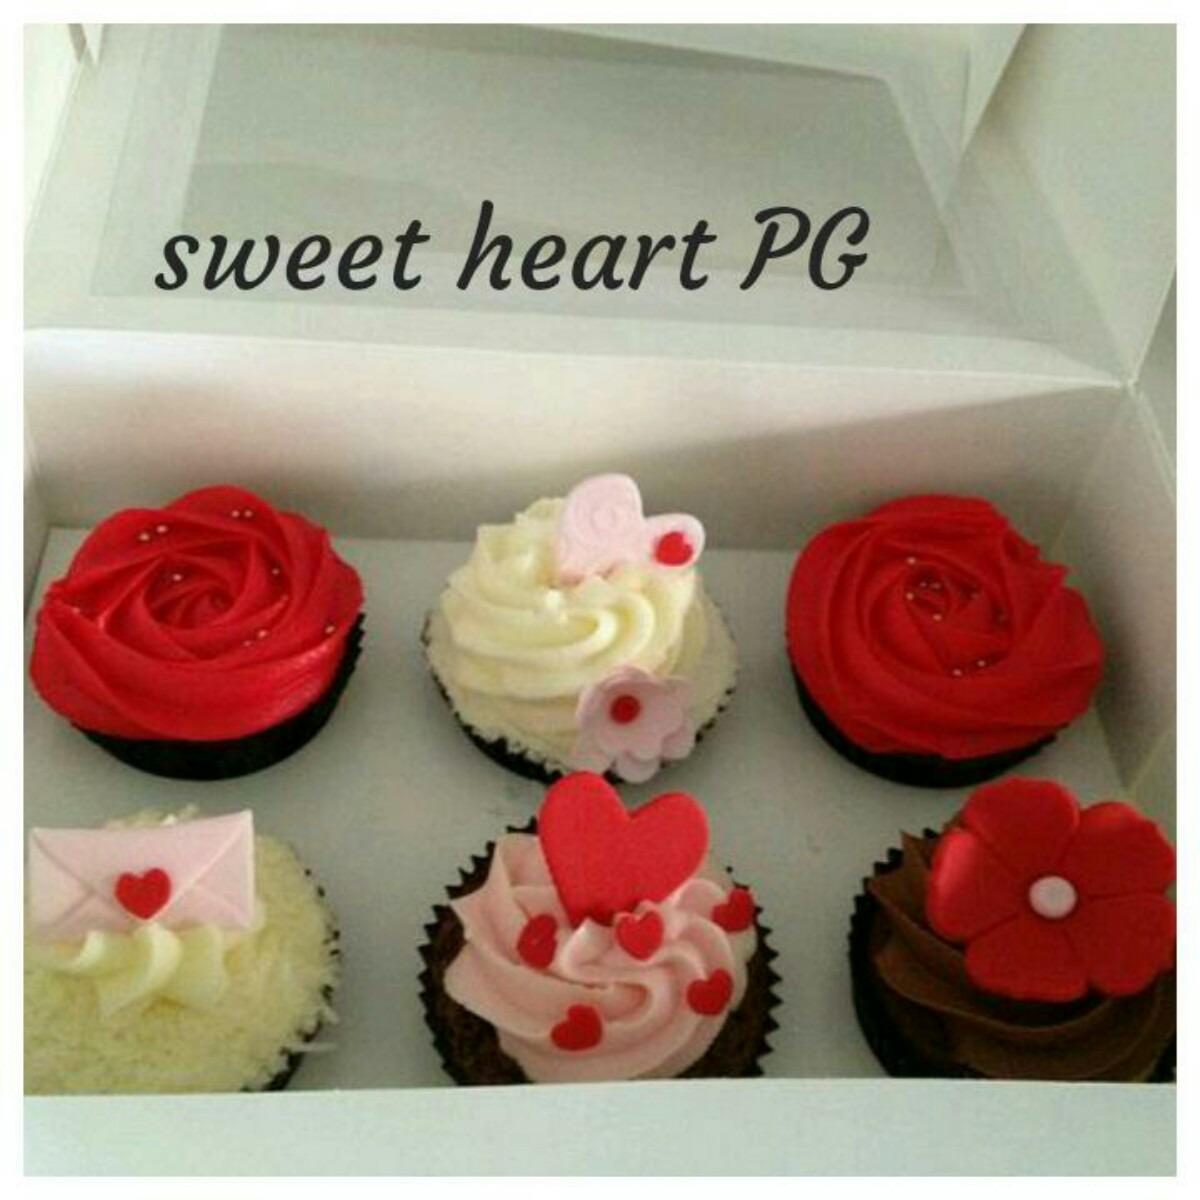 San Valentin Dia Enamorados Regalo Original Cupcake Y Cookie  ~ Regalos Originales San Valentin